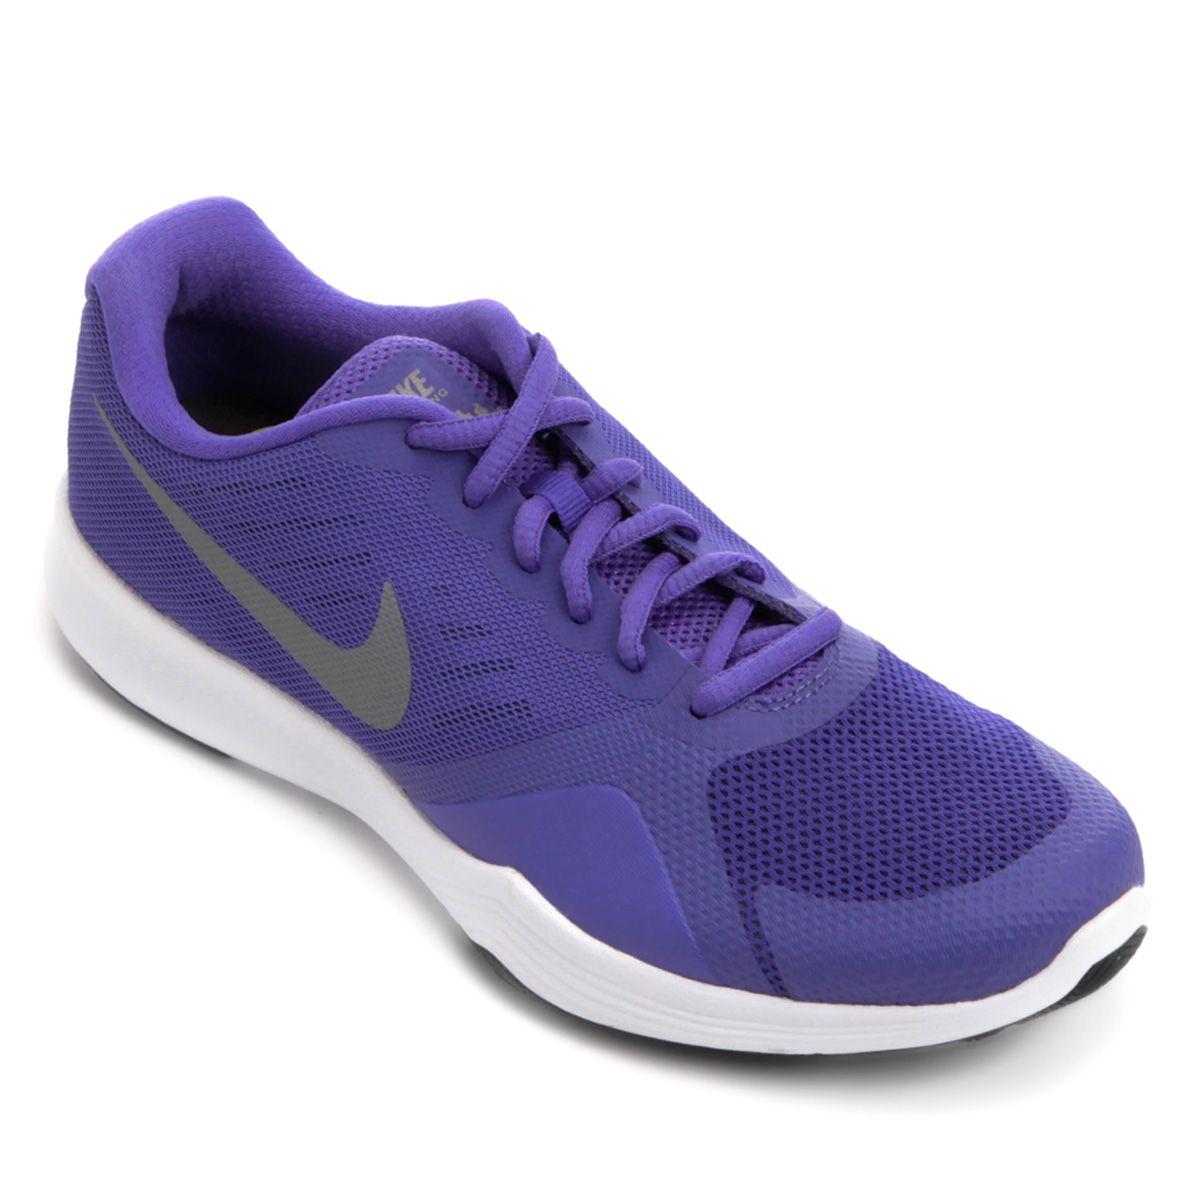 8519d6dbb0 Tênis Feminino Nike City Trainer - BRACIA SHOP  Loja de Roupas ...